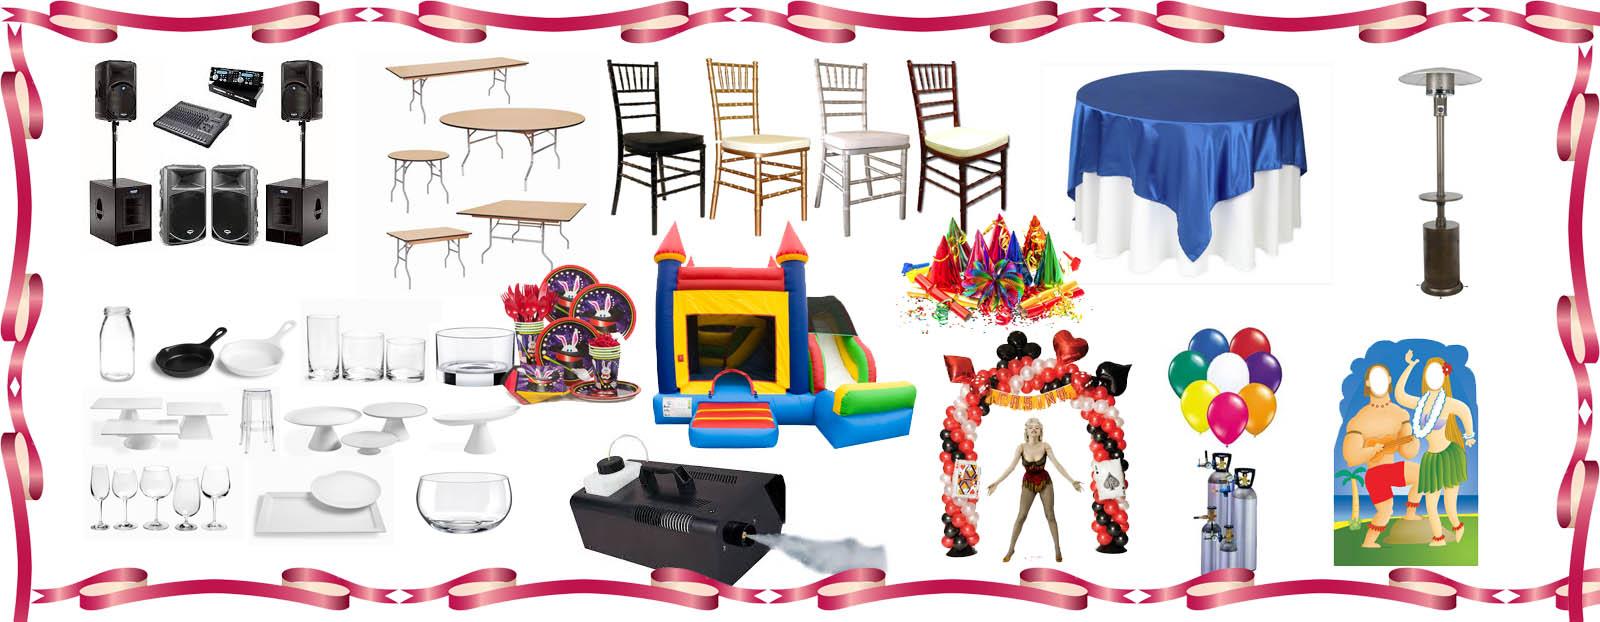 Party Supply Rentals